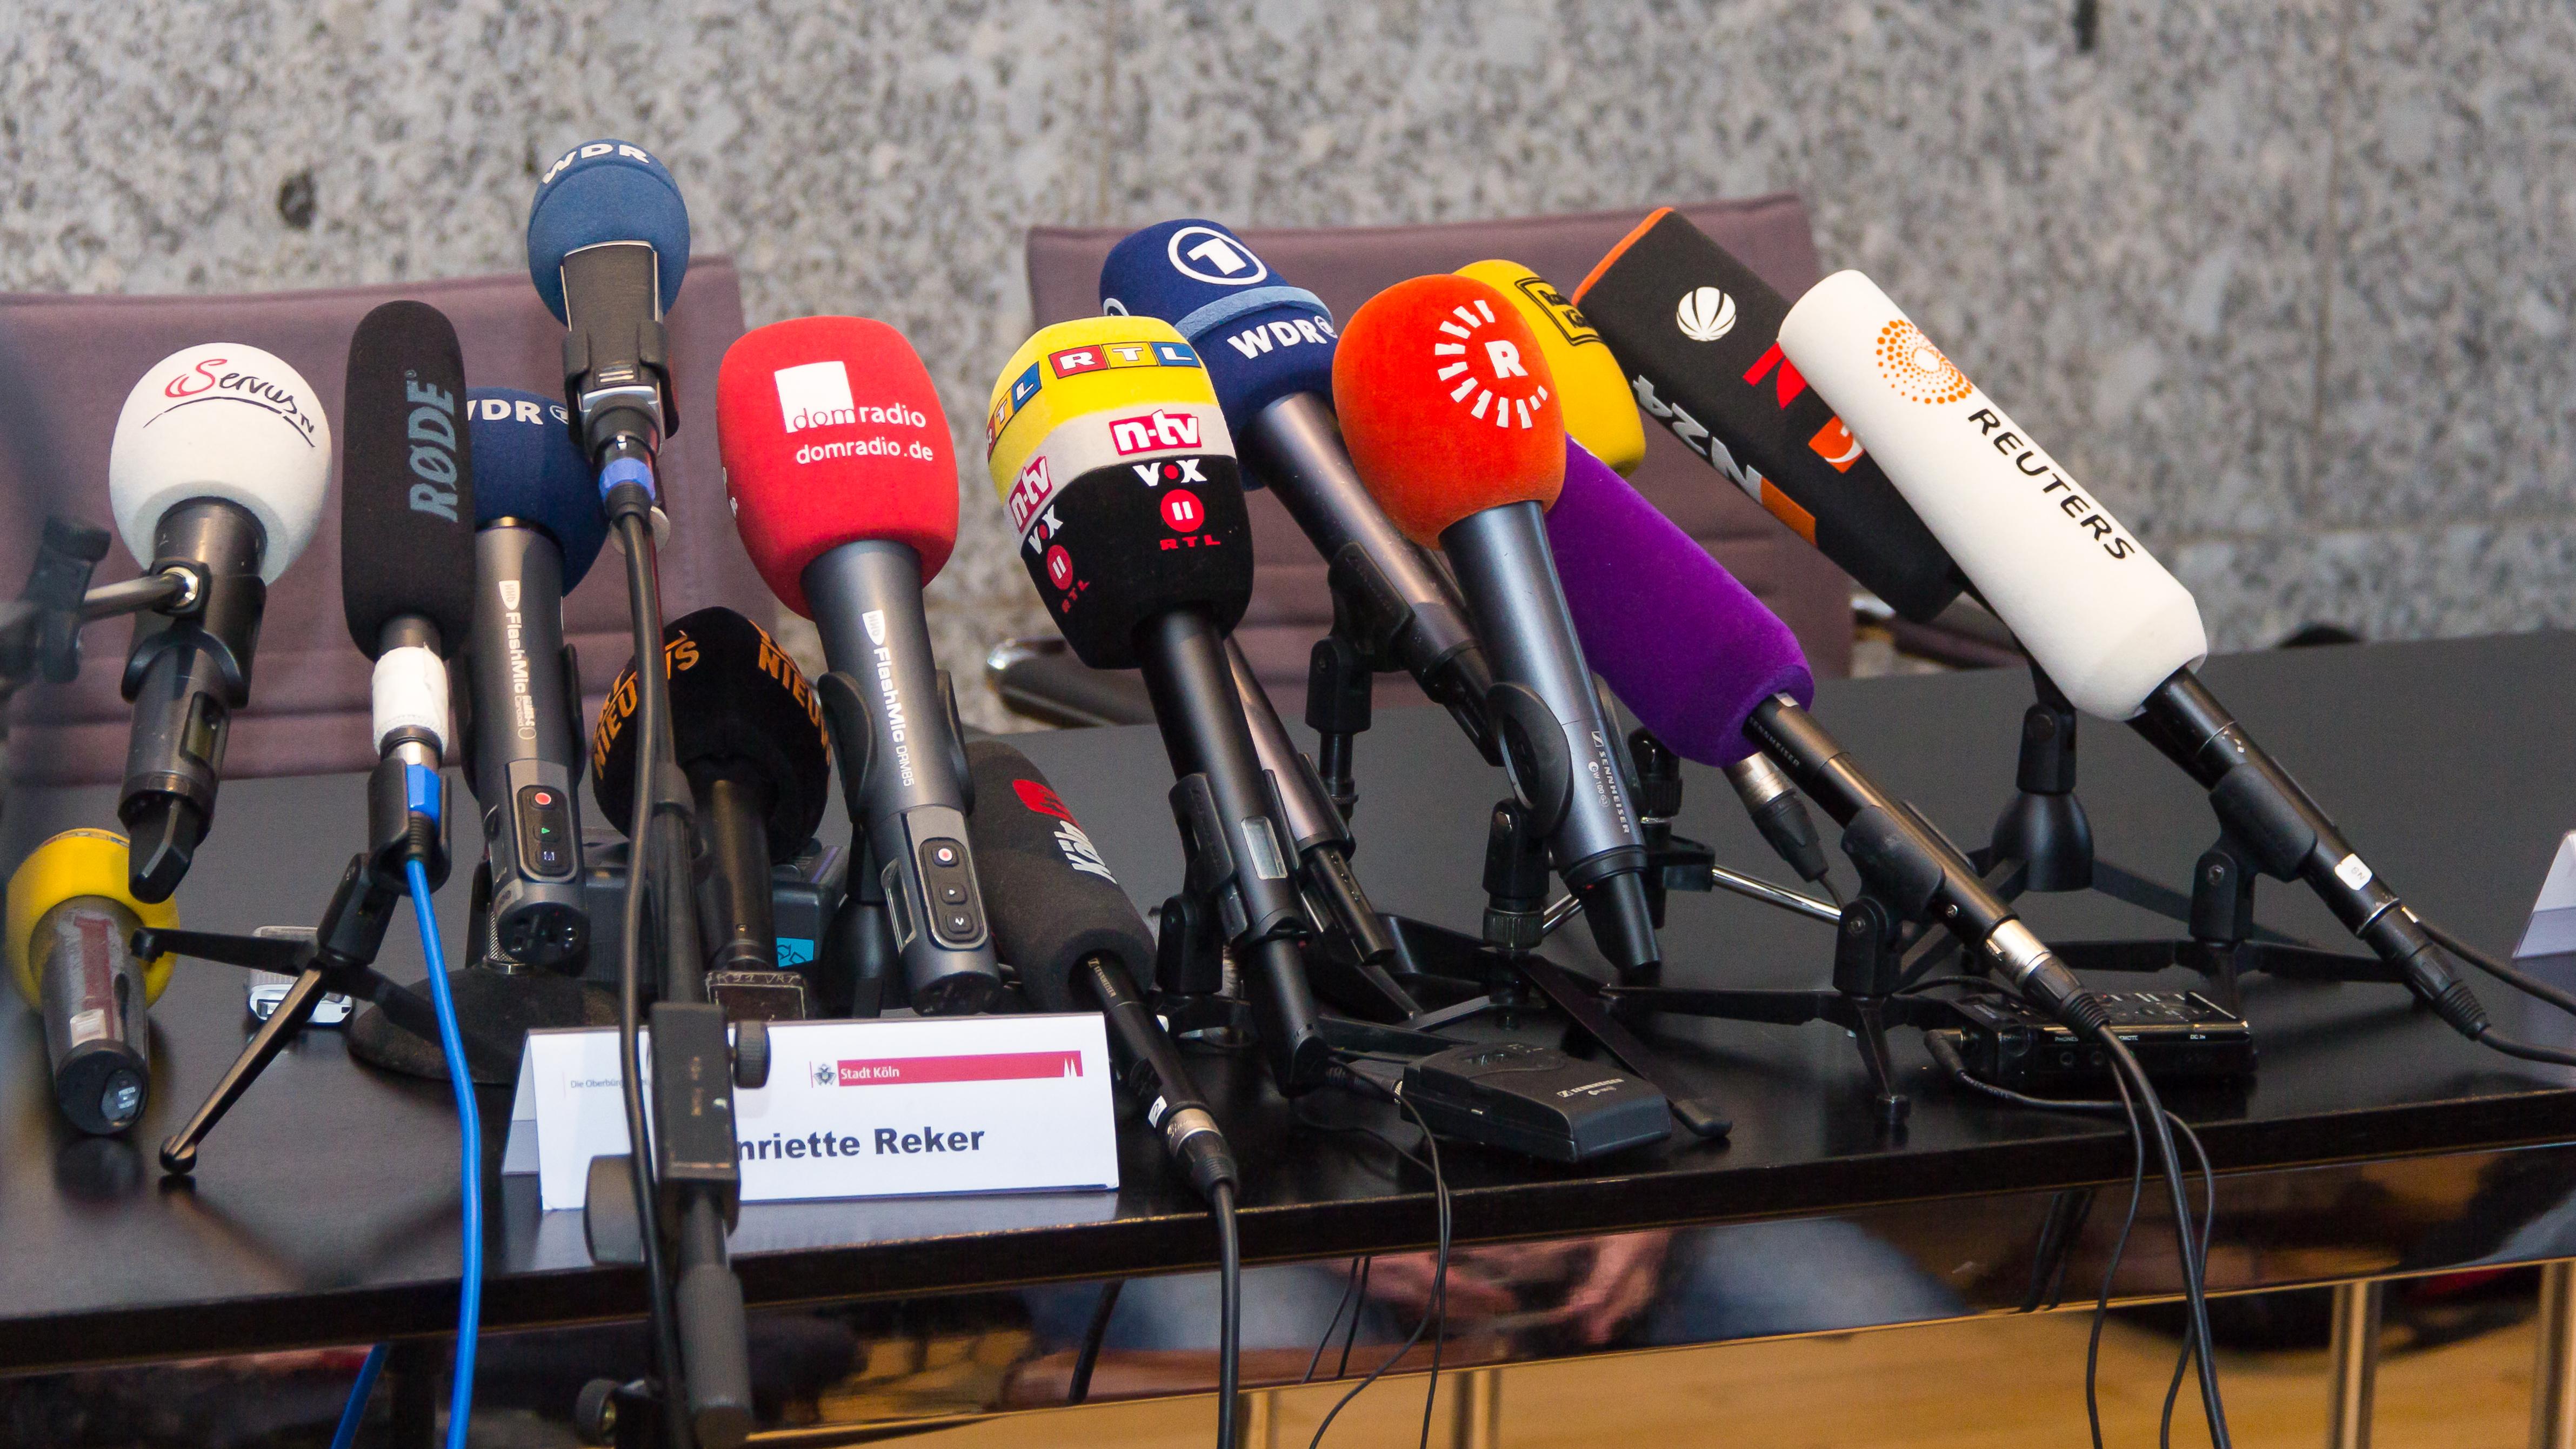 Mikrofone Pressekonferenz: Quelle: WikiCommons